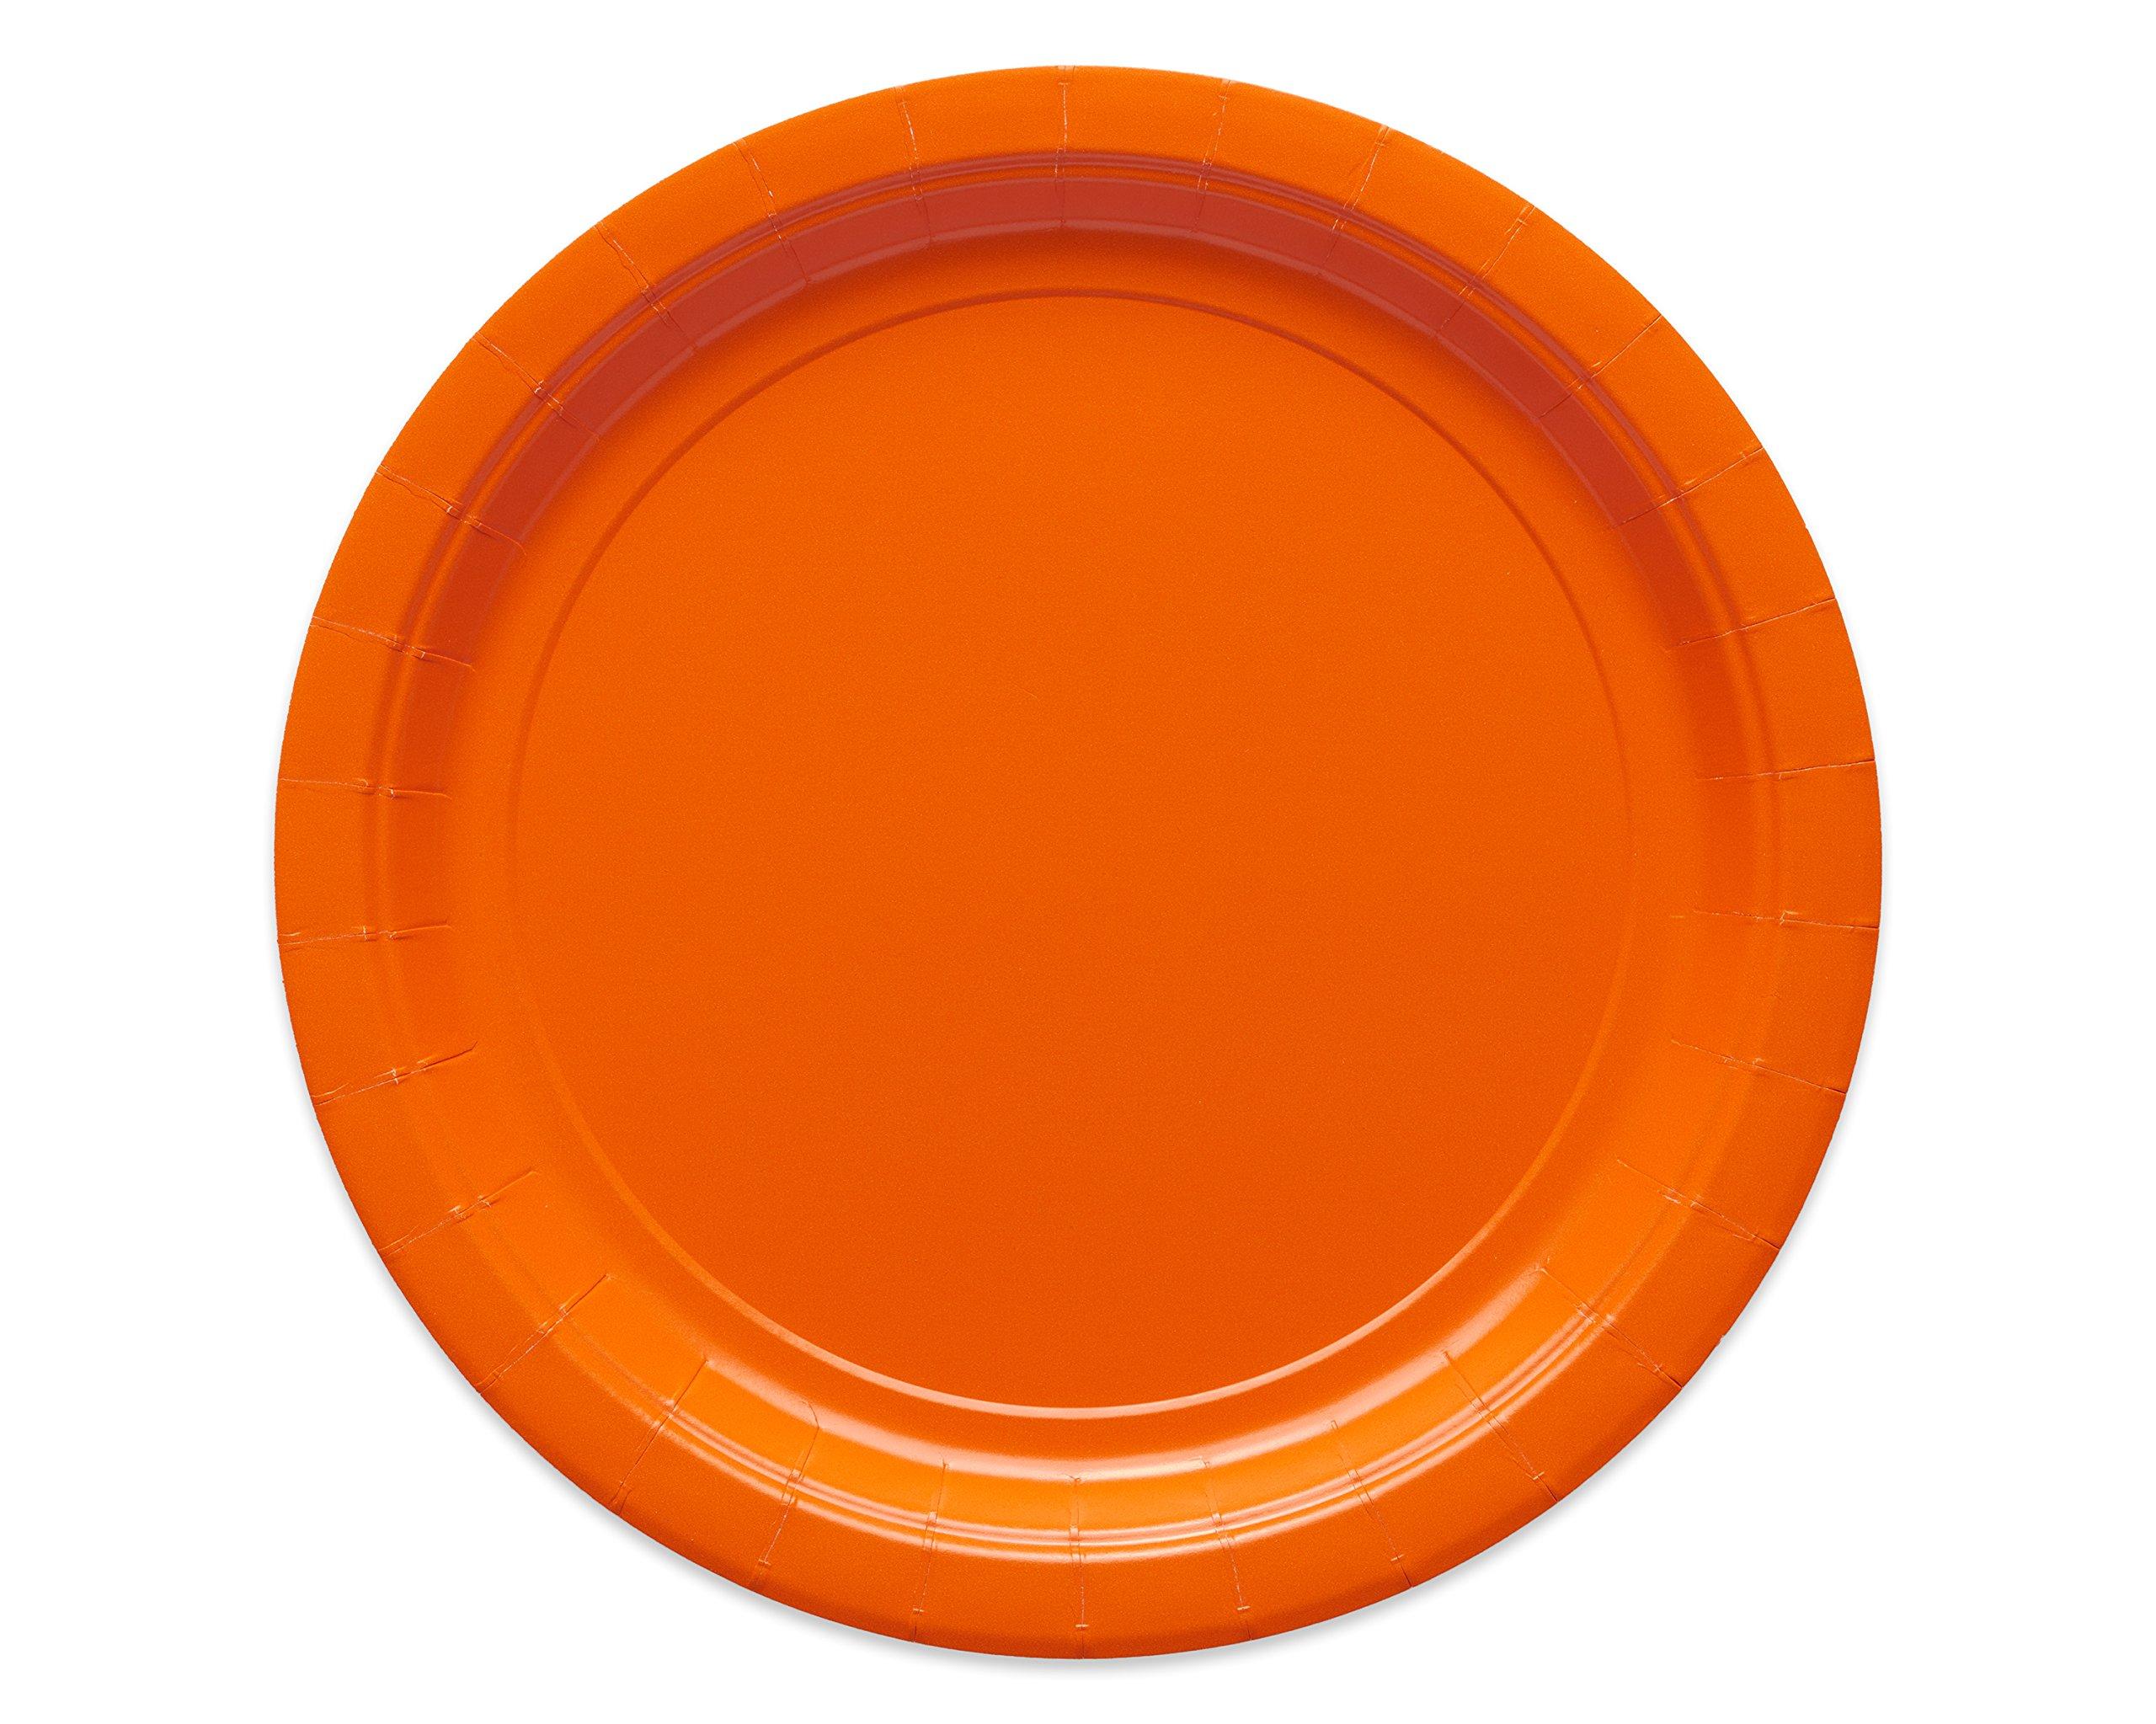 American Greetings Large Paper Plate, Orange